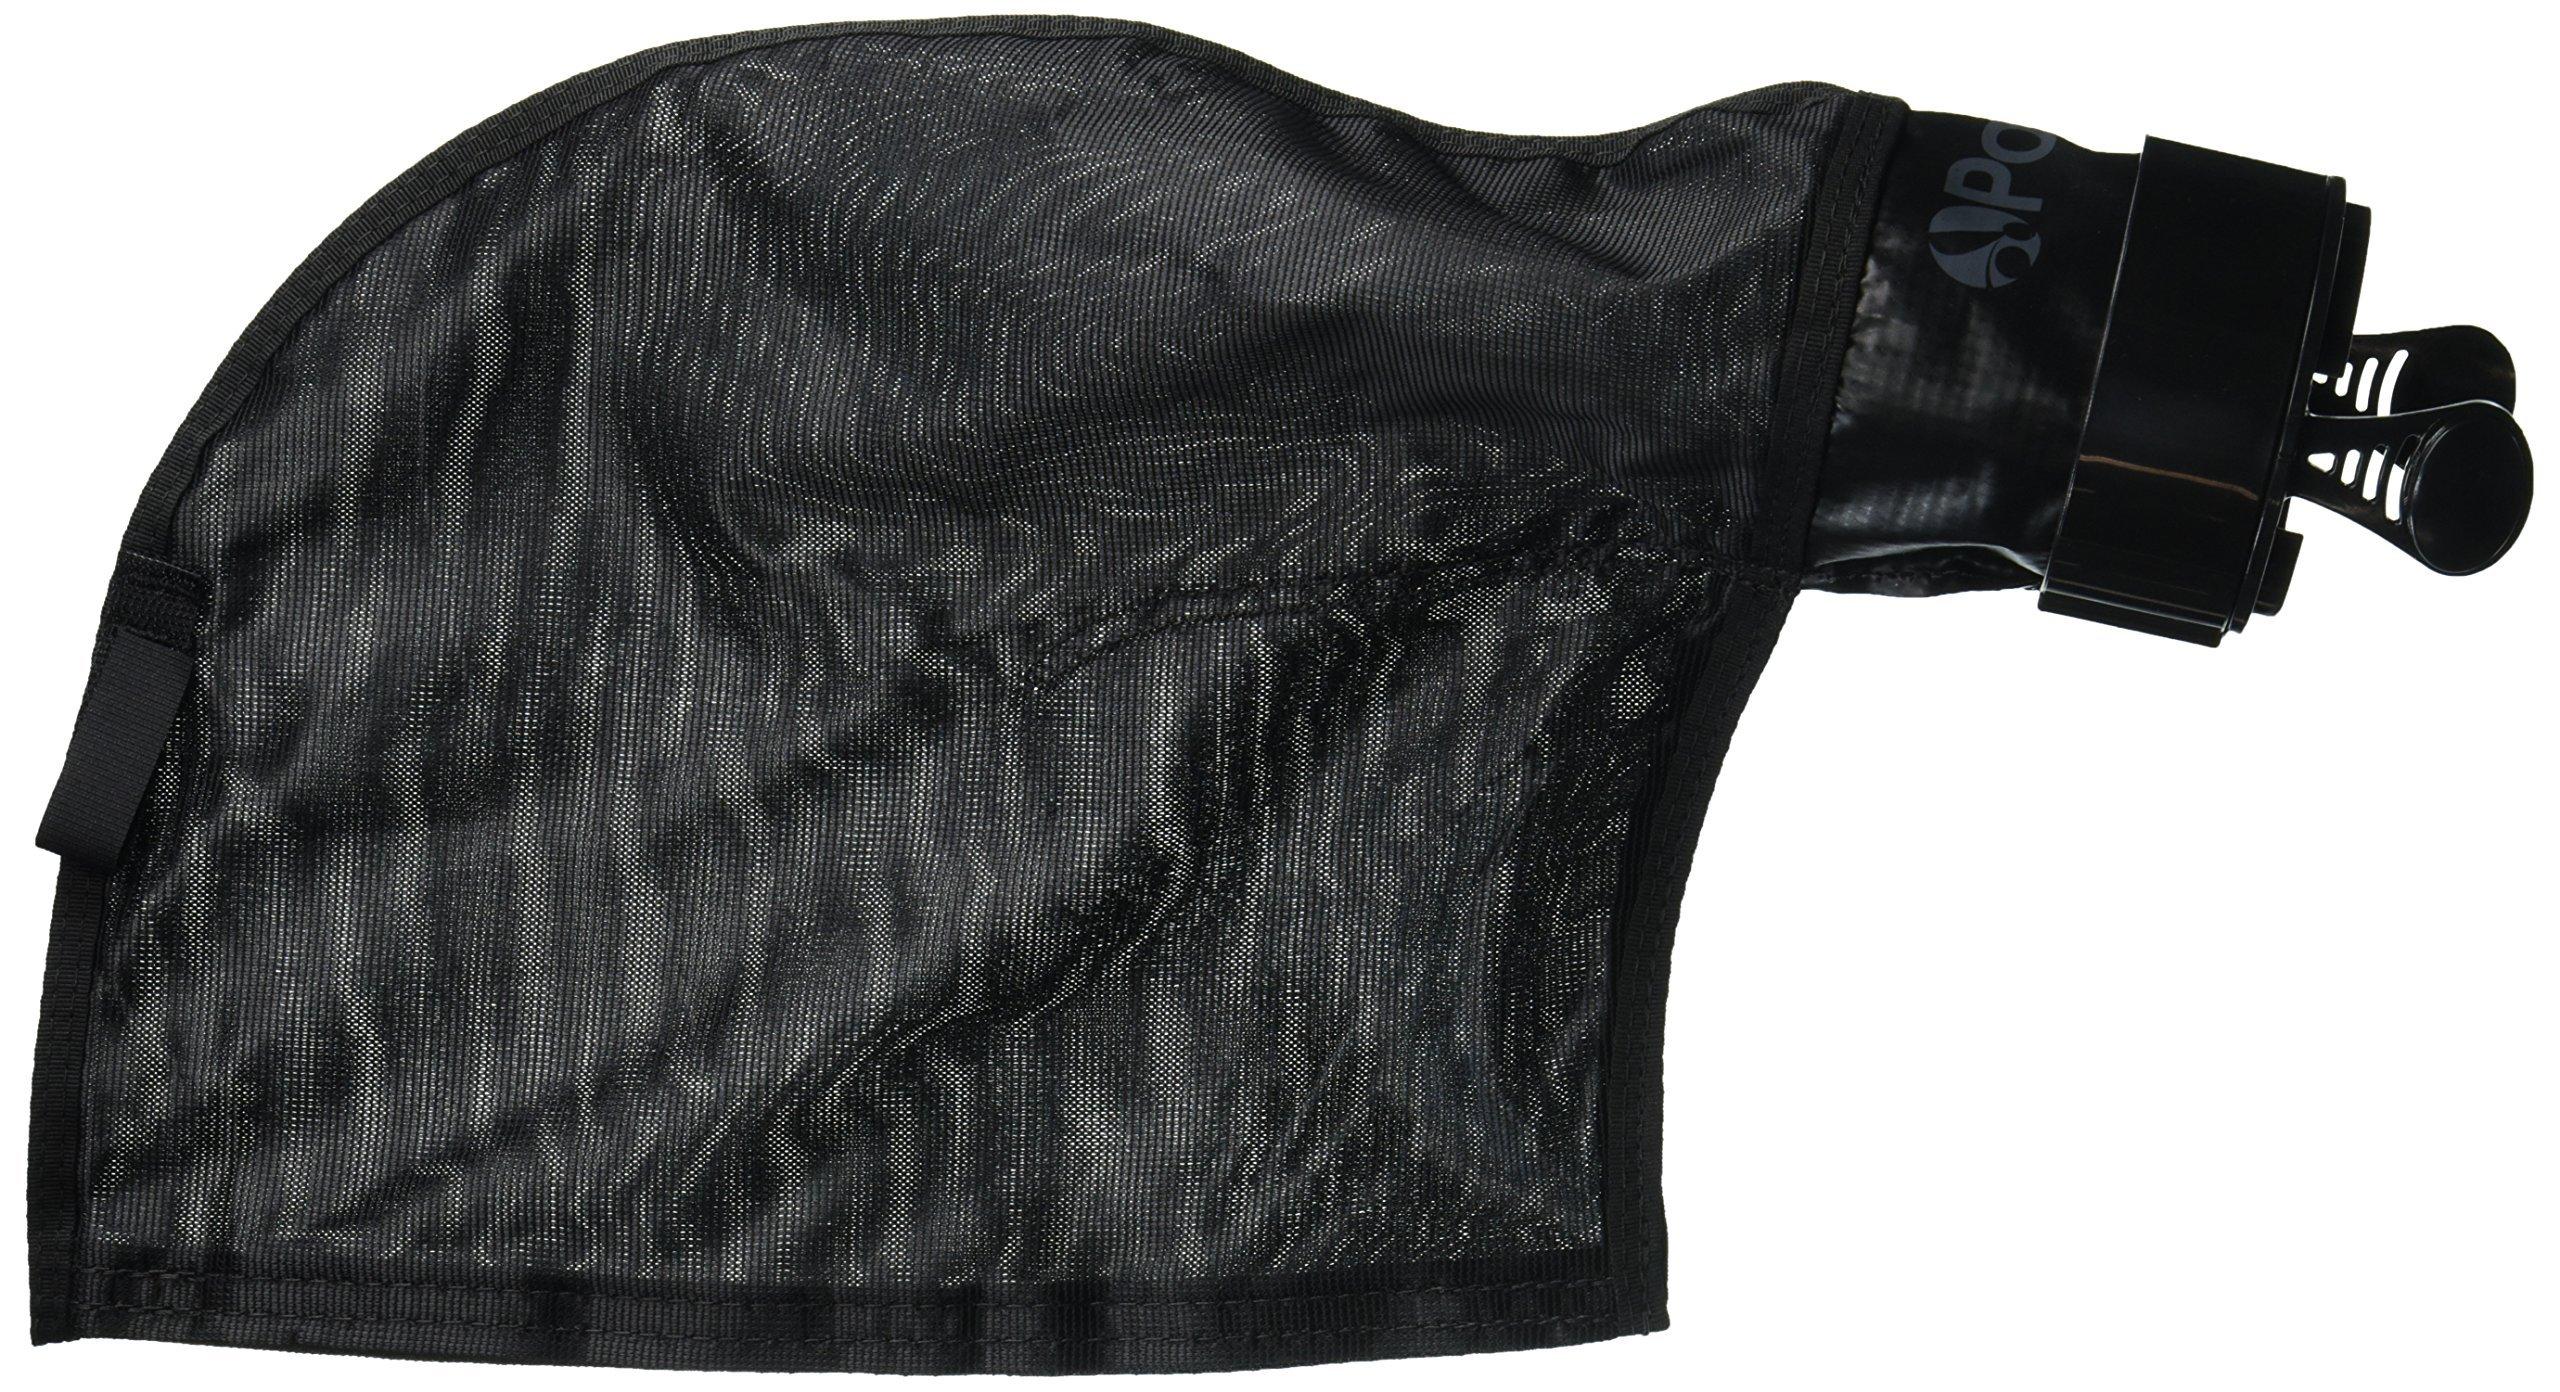 Zodiac K17 All Purpose Bag Replacement